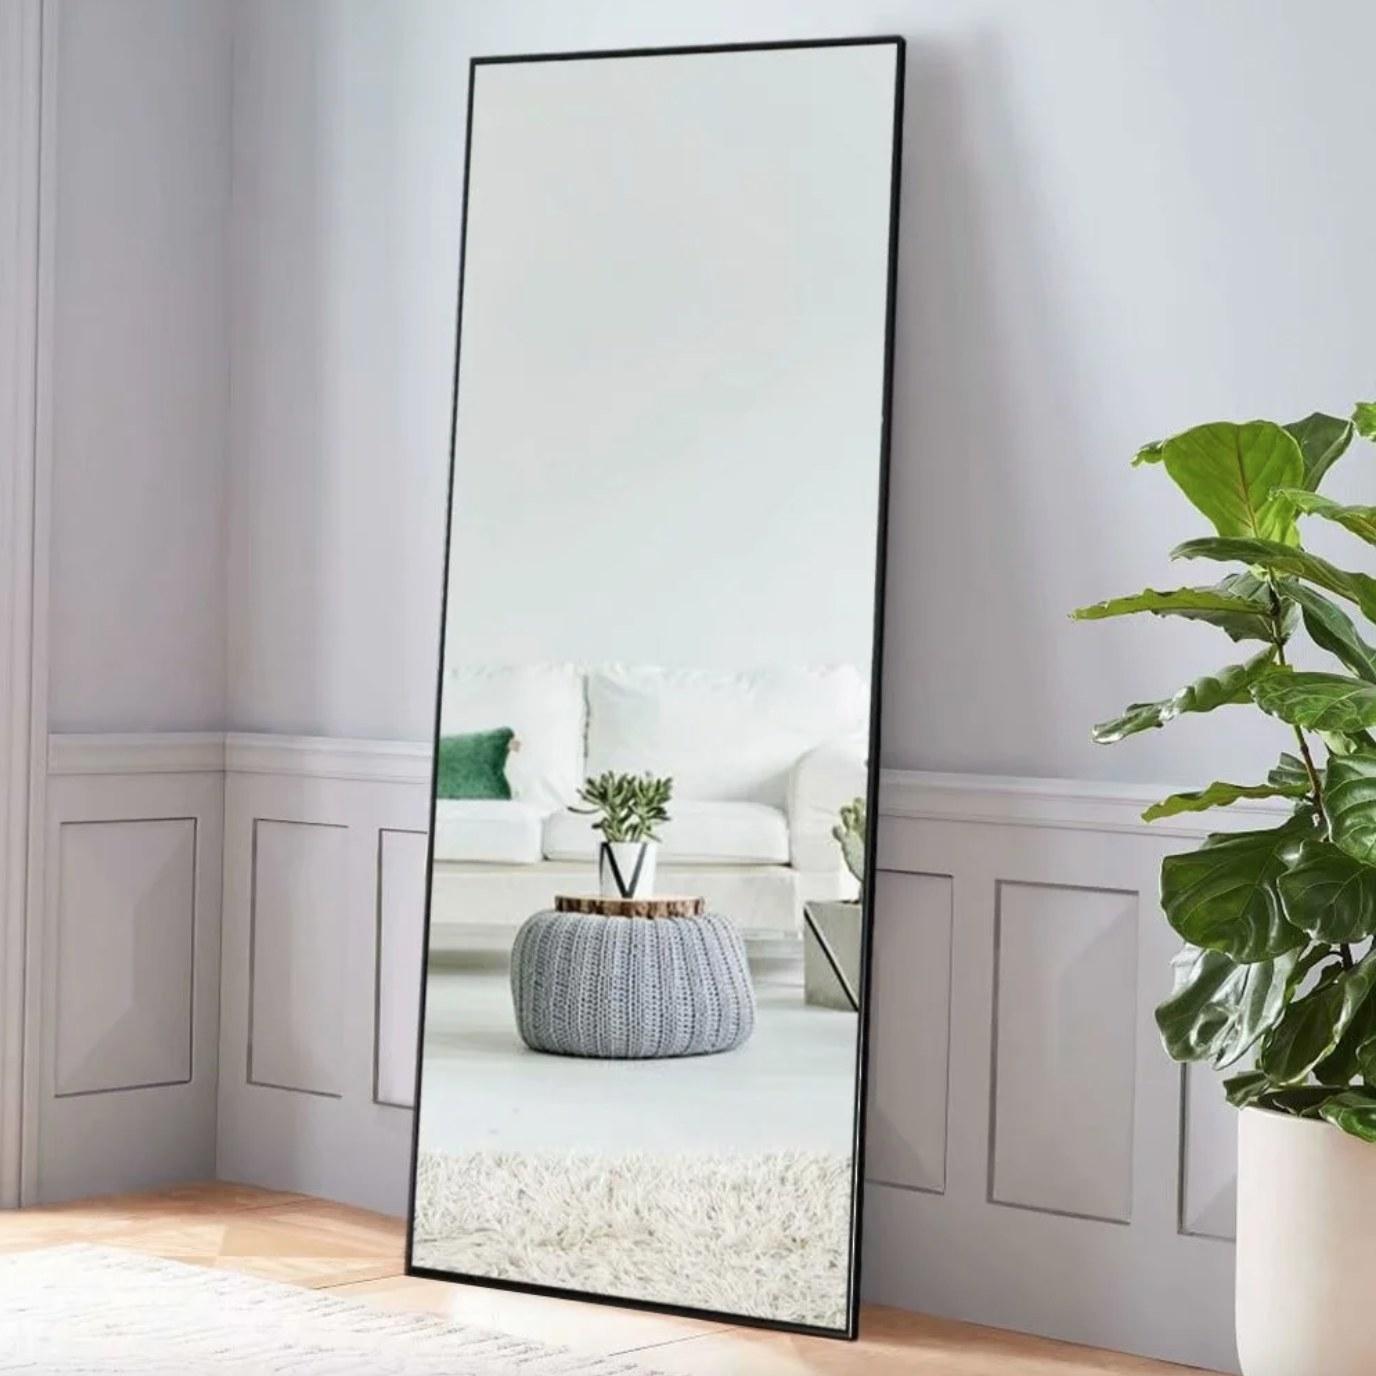 The floor length mirror in black